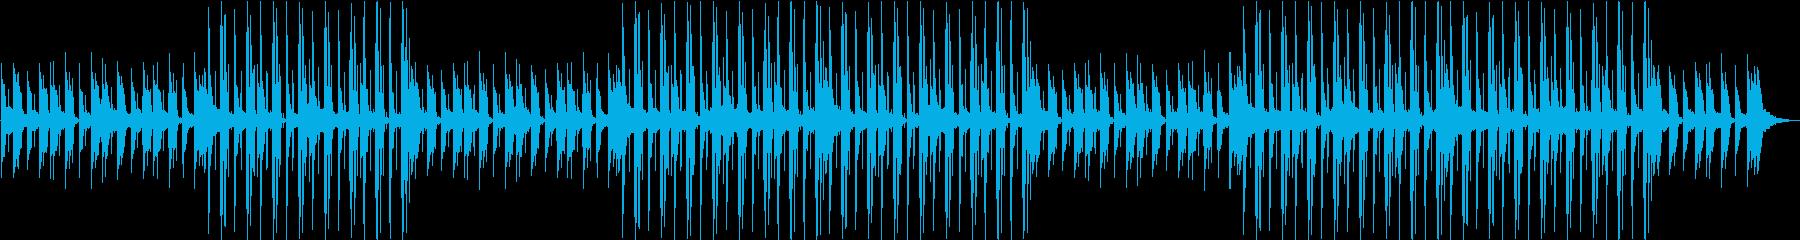 R&B・lofi・夜・リラックス・ムードの再生済みの波形